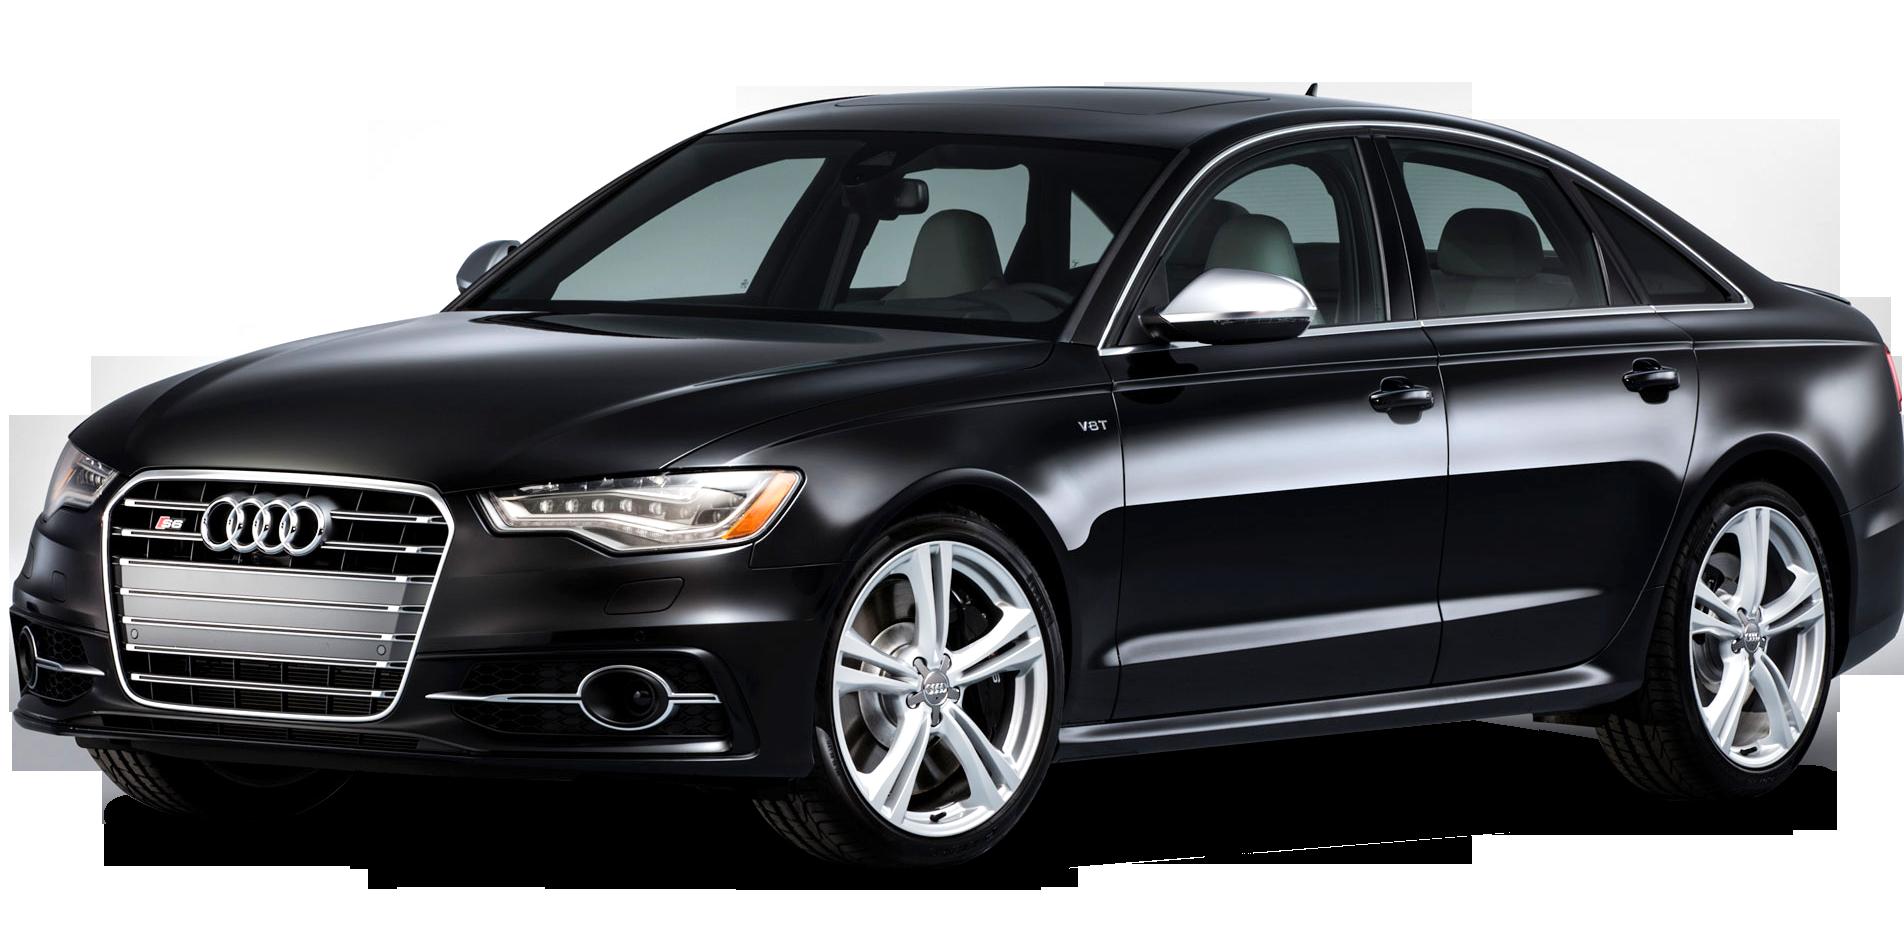 Audi A4 Car PNG image black side view